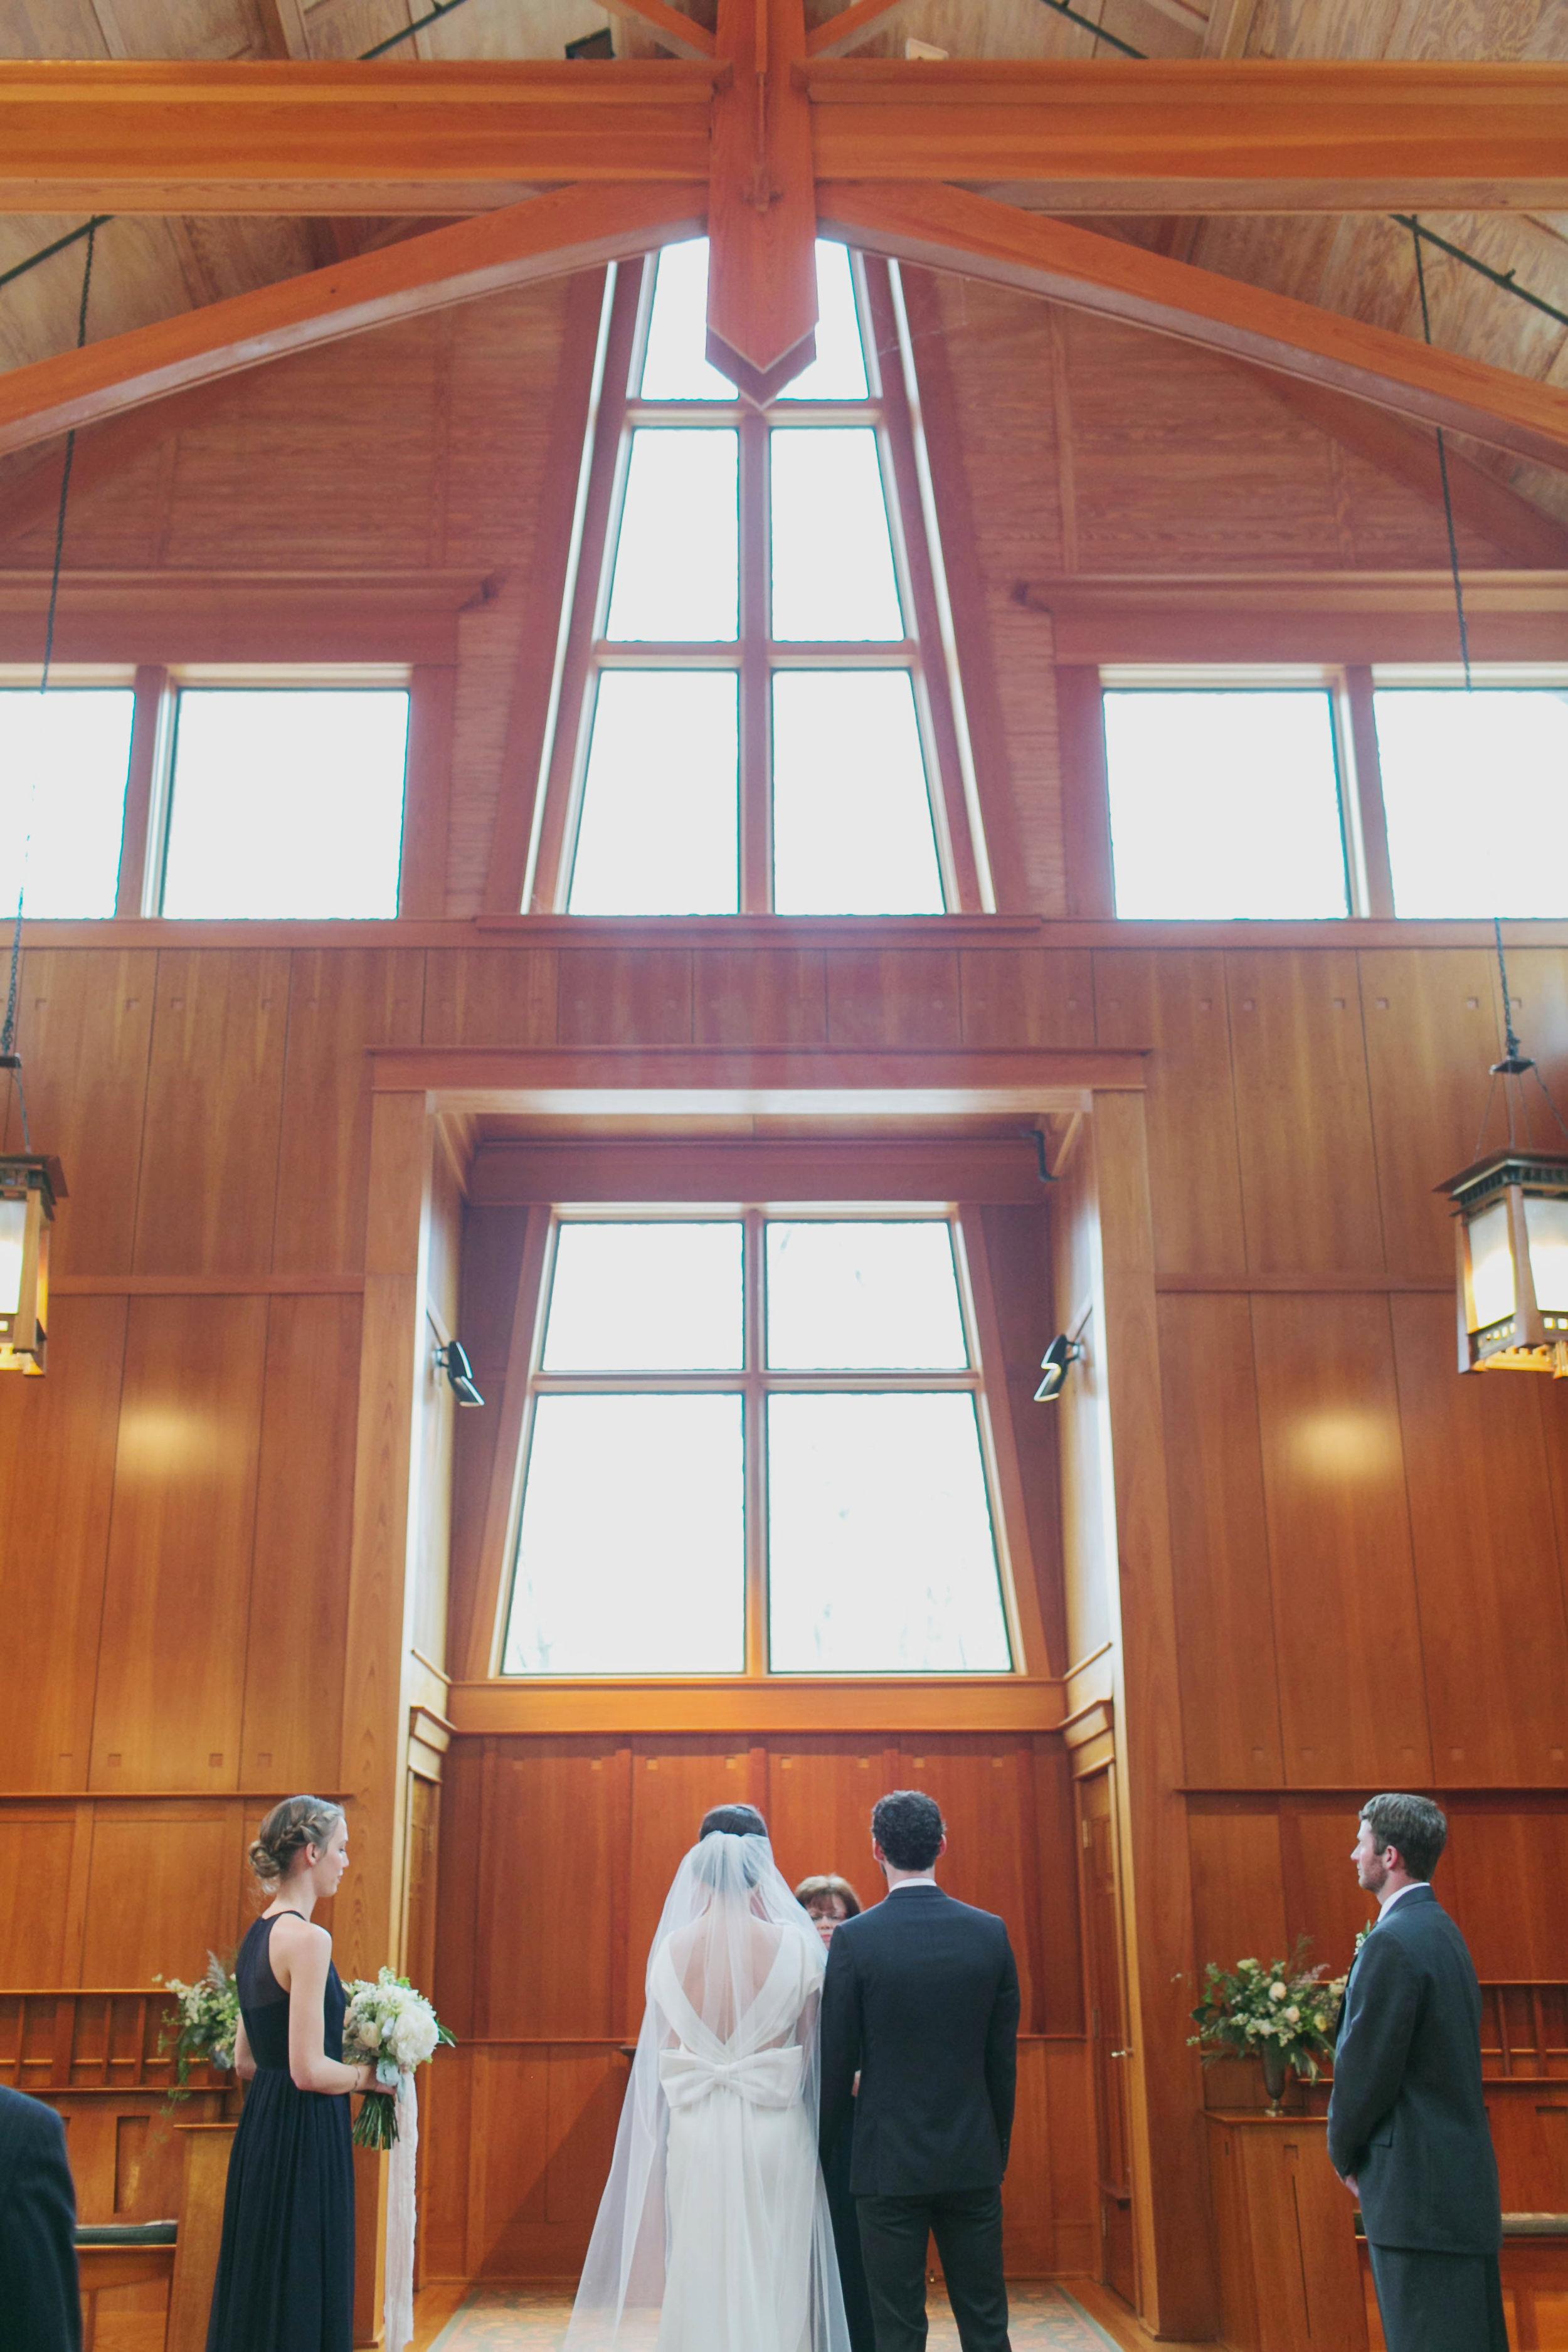 Simply-Charming-Socials_Atlanta-Wedding-Planner_Our-Labor-Of-Love_Emily-and-Jon_17.jpg